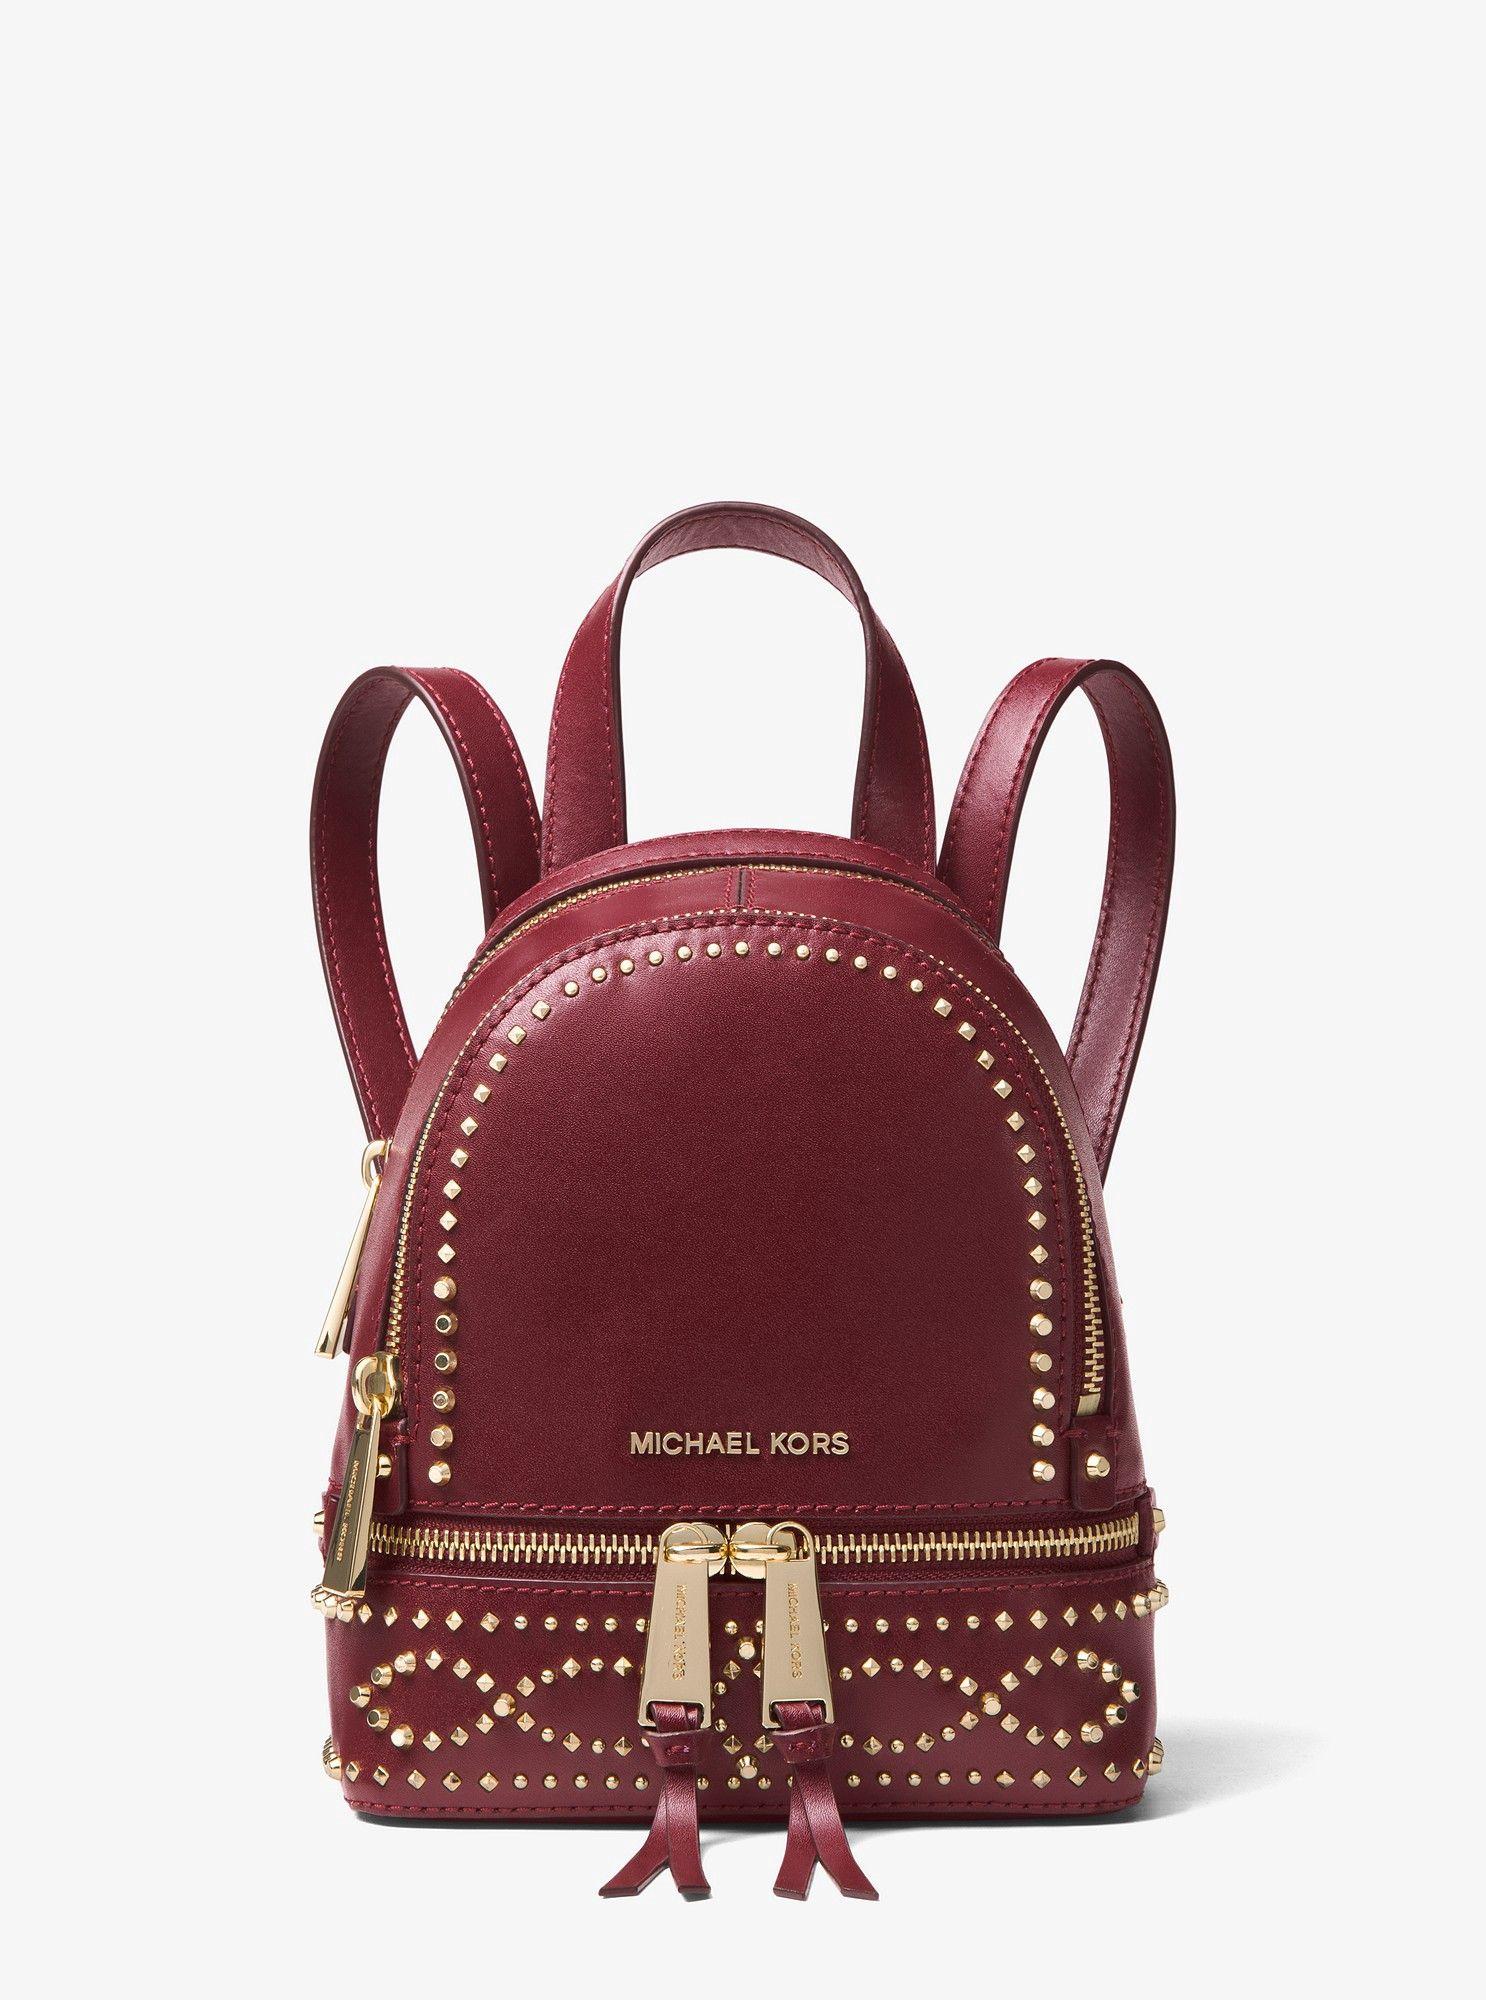 28466d23585e Michael Kors Rhea Mini Studded Leather Backpack - Oxblood in 2019 ...